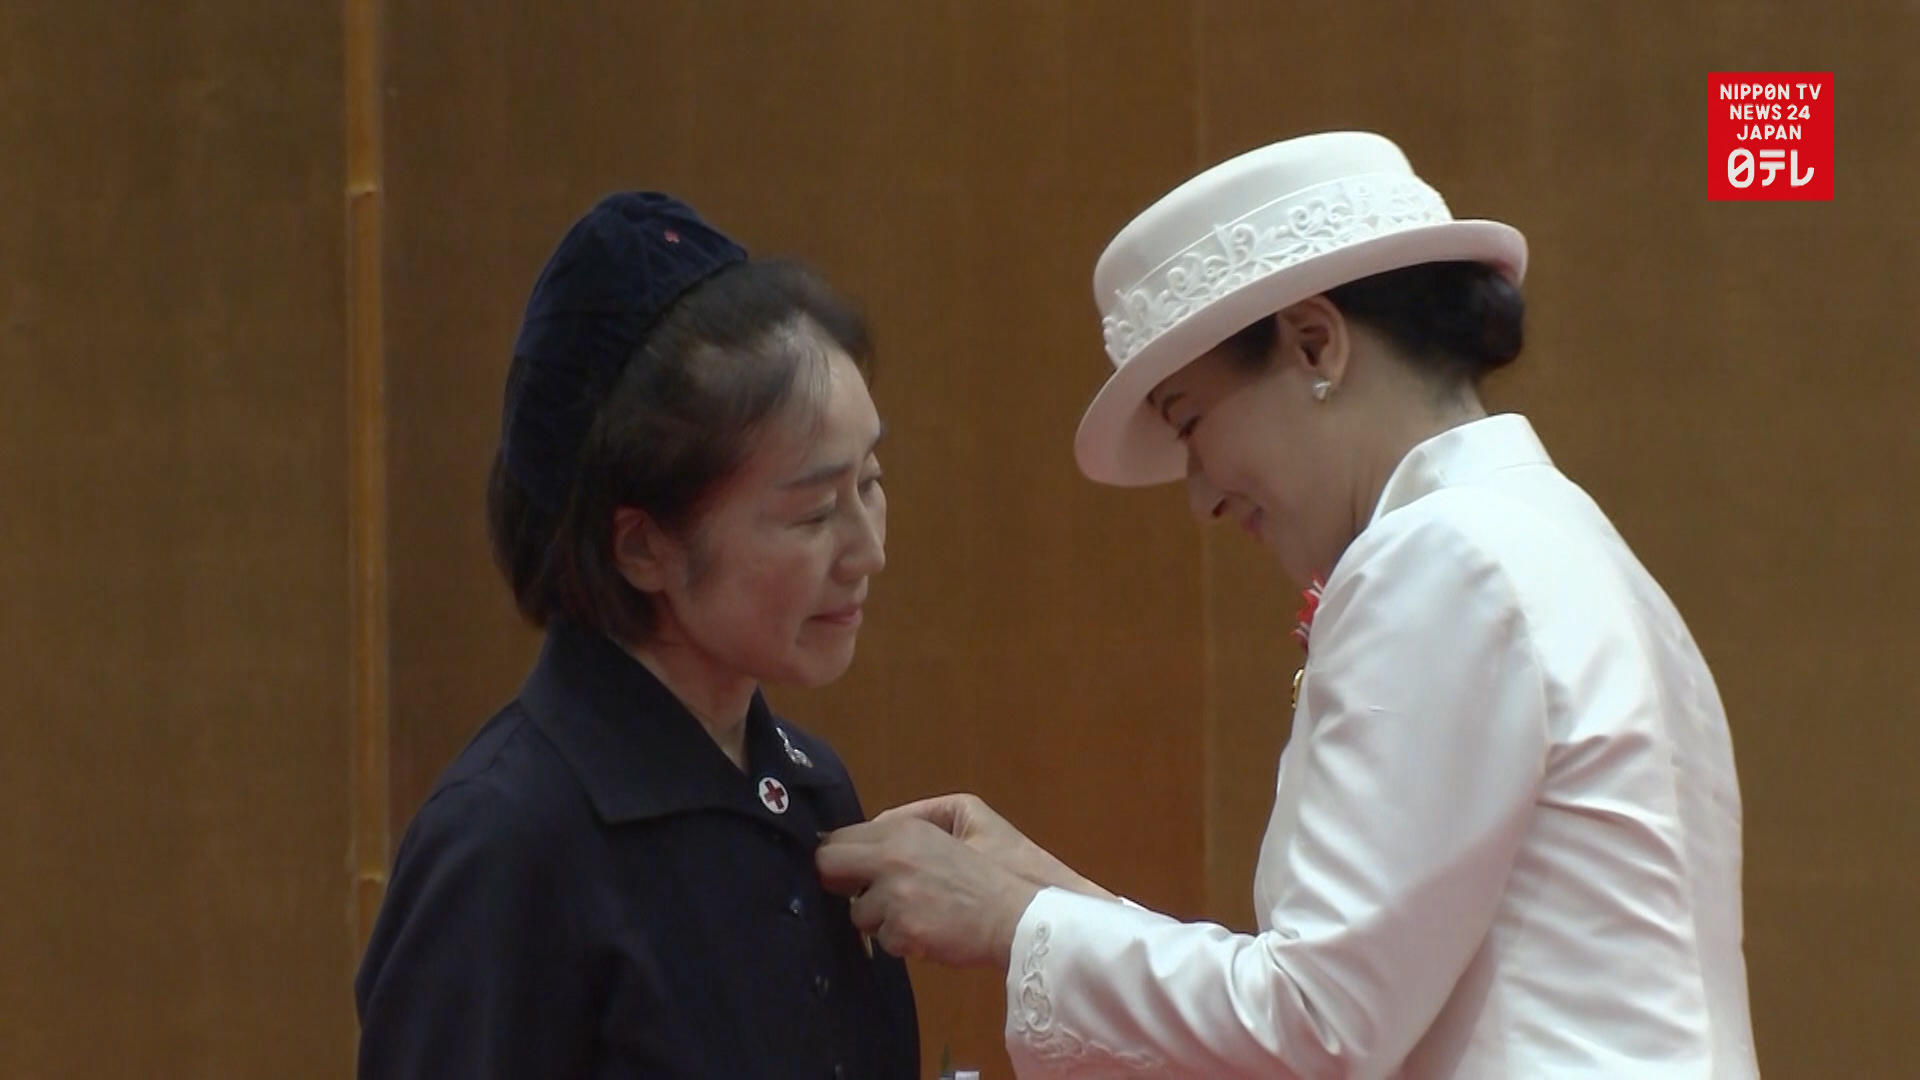 Empress Masako attends Nightingale Medal Ceremony